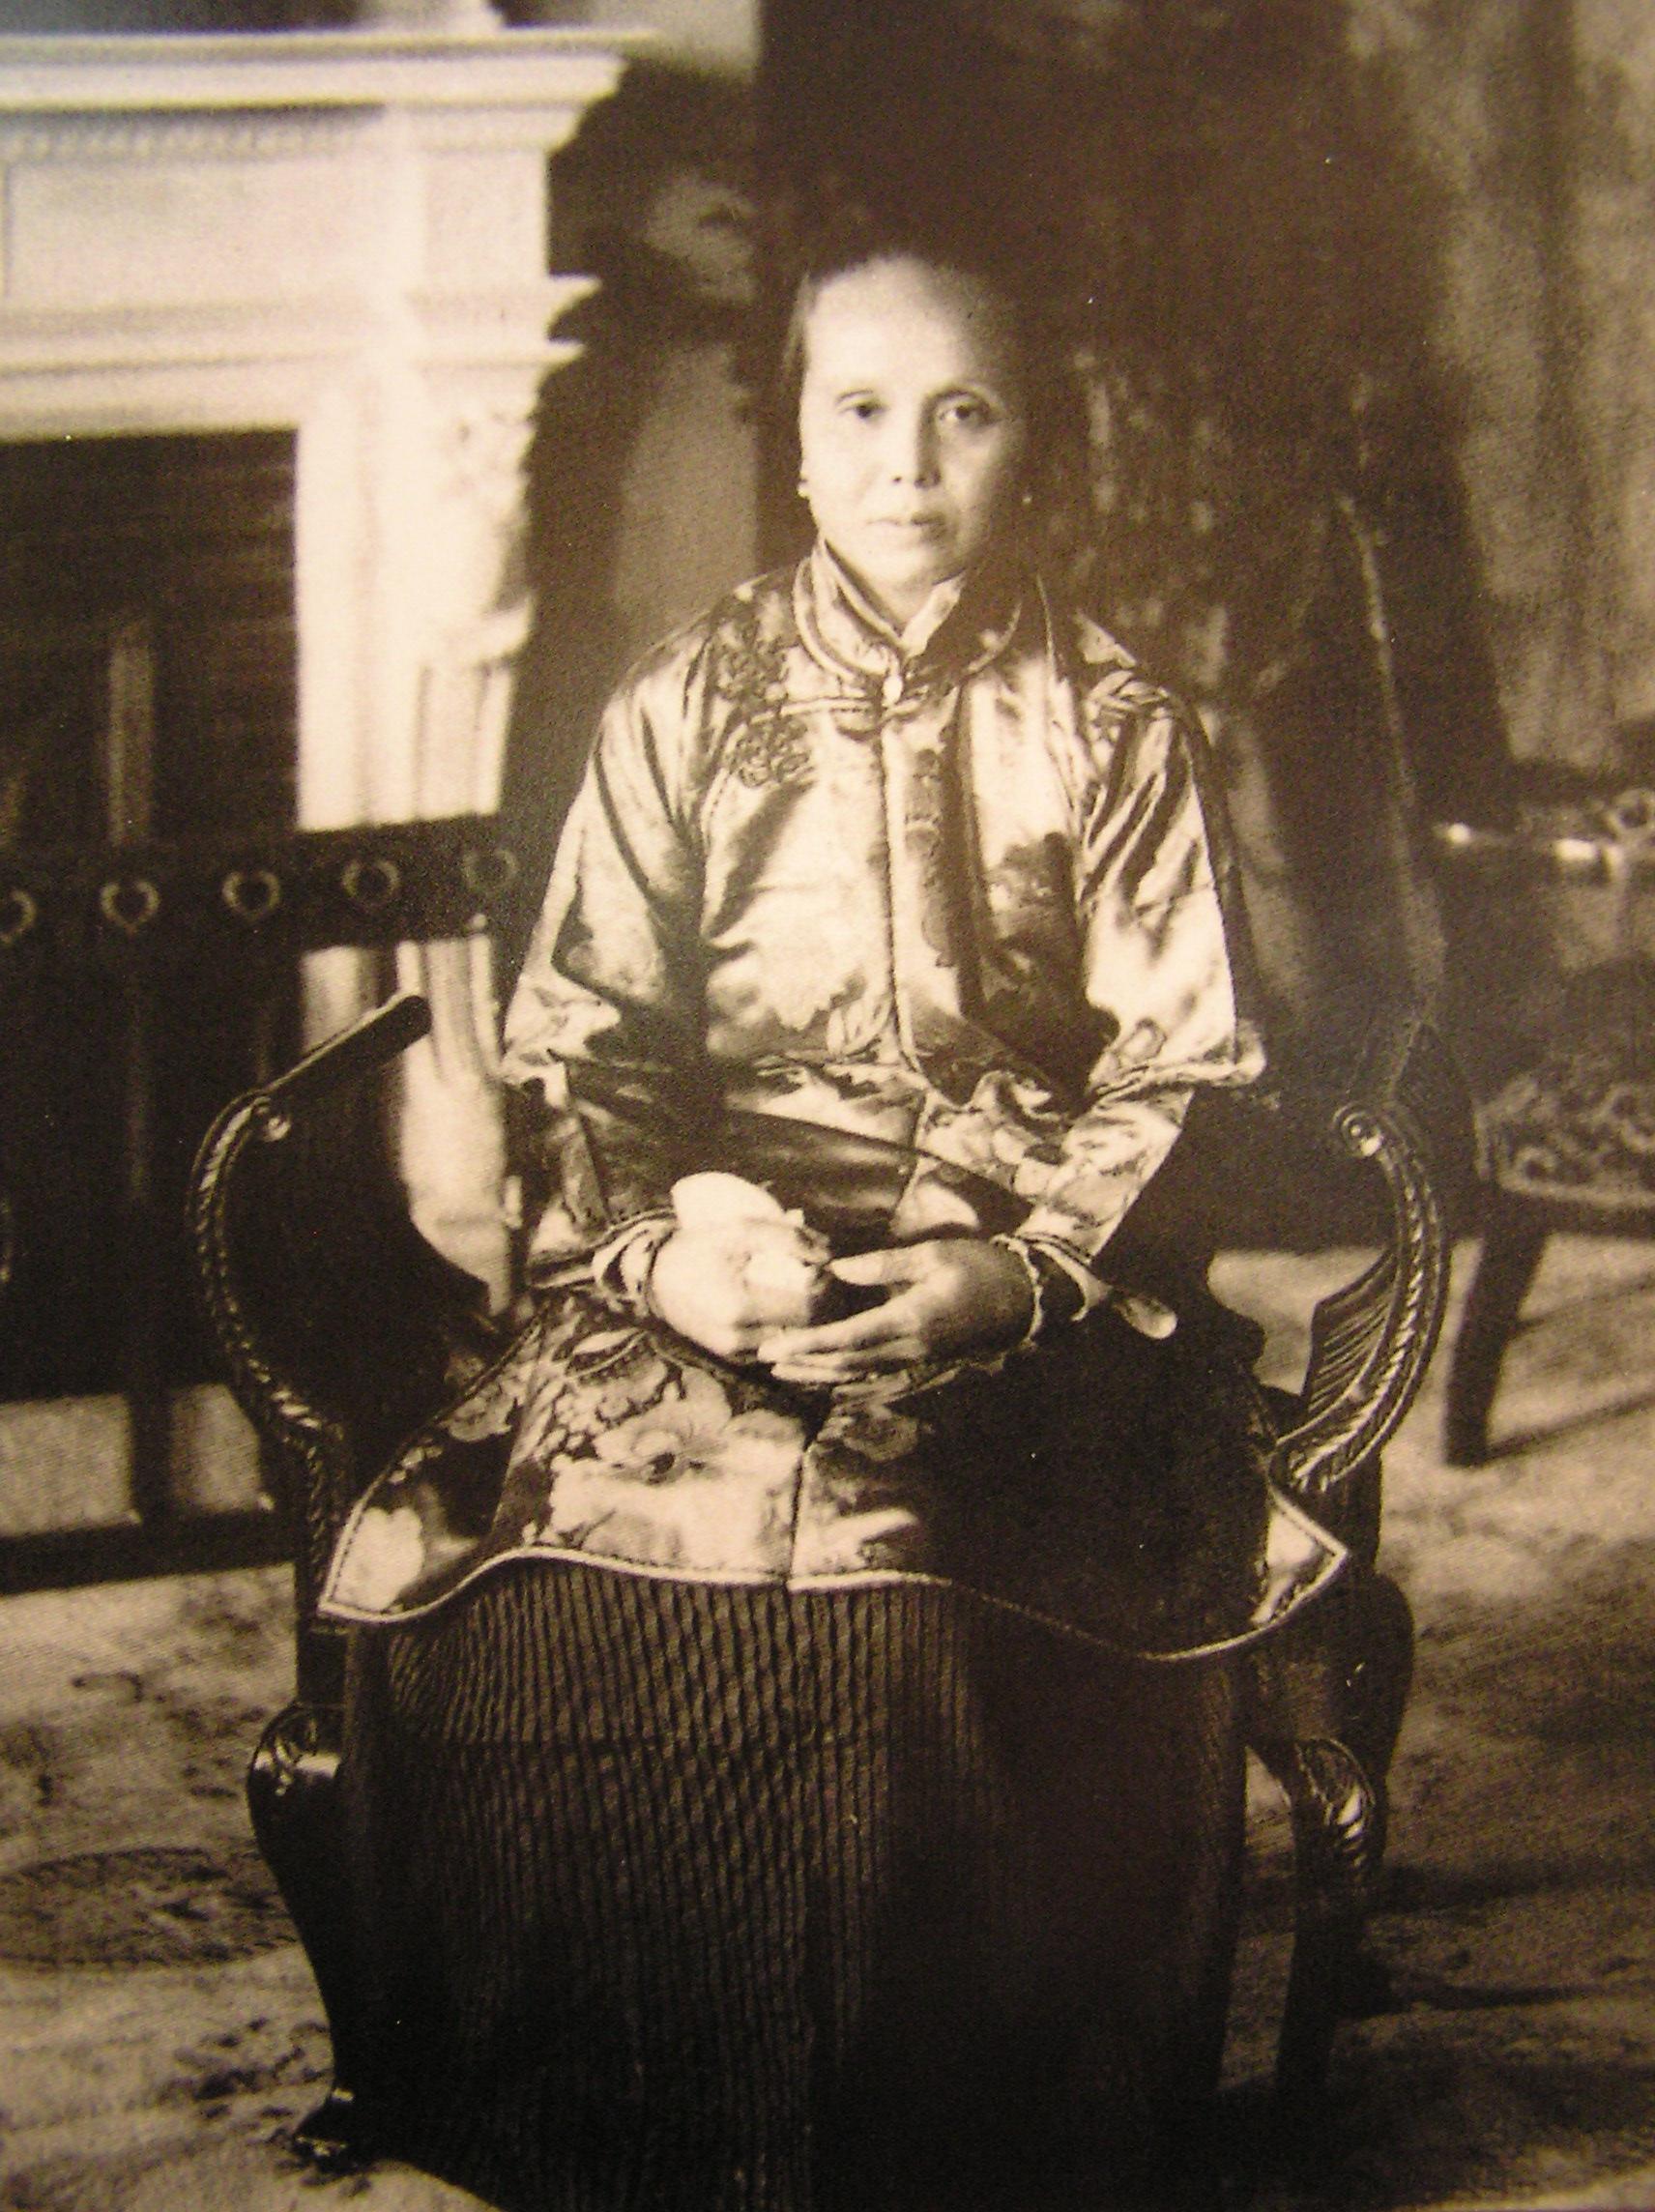 Lu Muzhen (1867 1952), Sun's first wife from 1885 to 1915